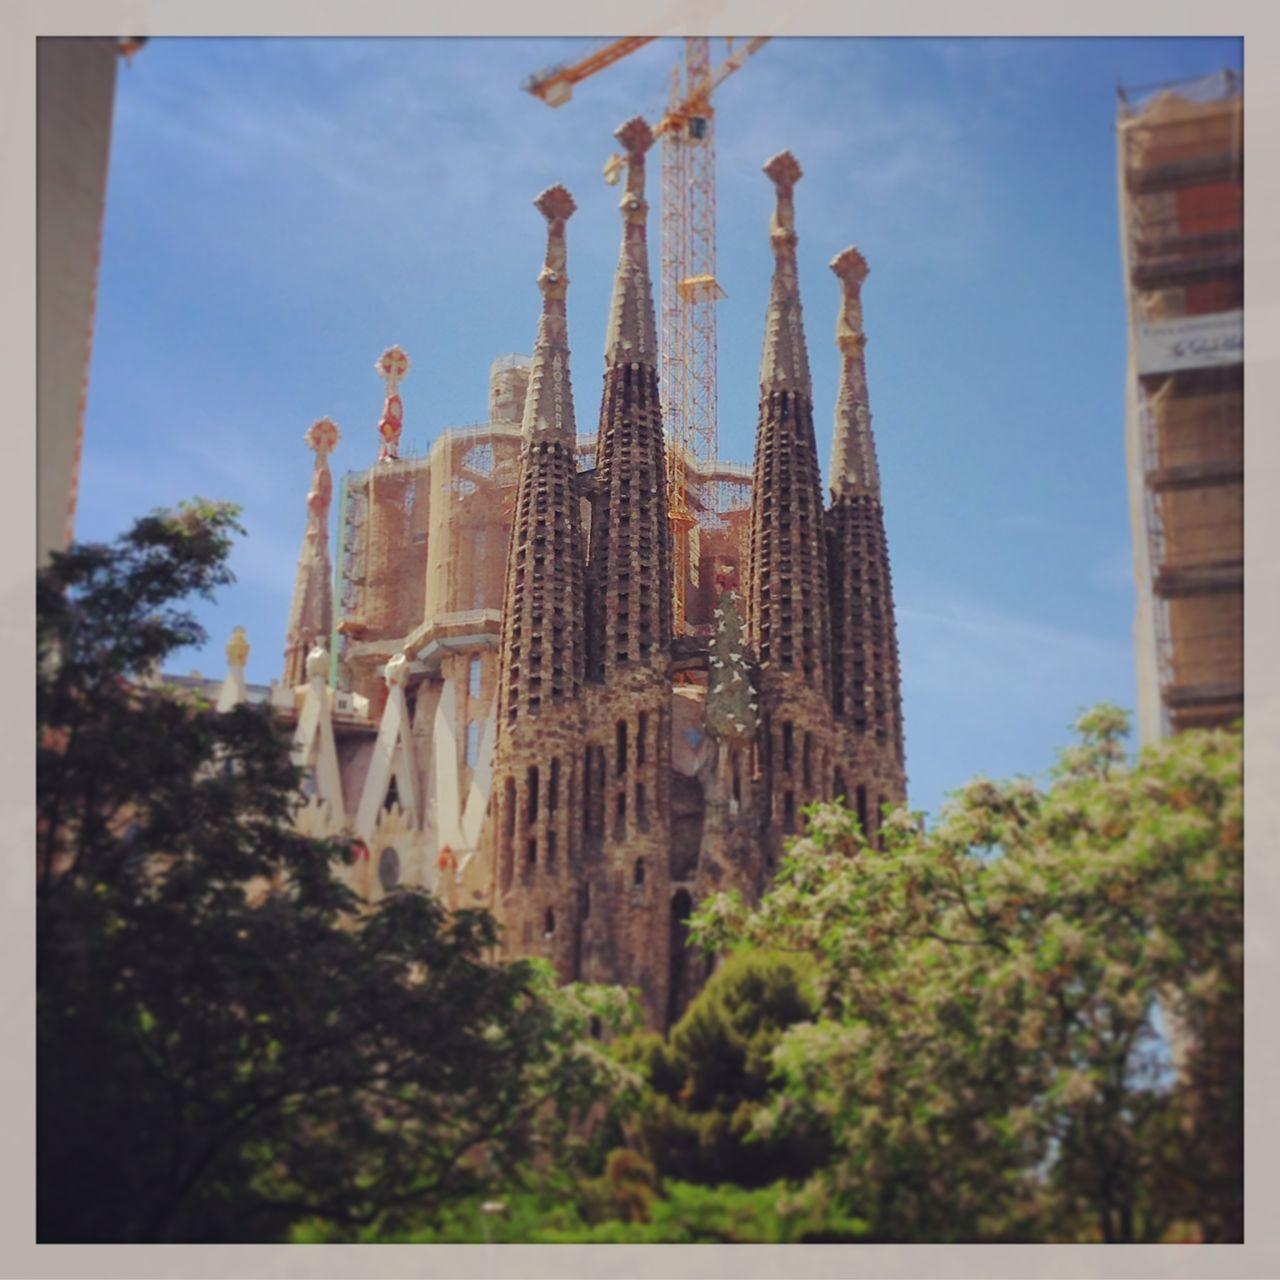 Architecture Building Exterior Built Structure City Construction Construction Site Crane Day Gaudi Gaudi #barcelona History Low Angle View No People Outdoors Place Of Worship Religion Sagrada Familia Sagradafamilia Sky Spirituality Travel Destinations Tree